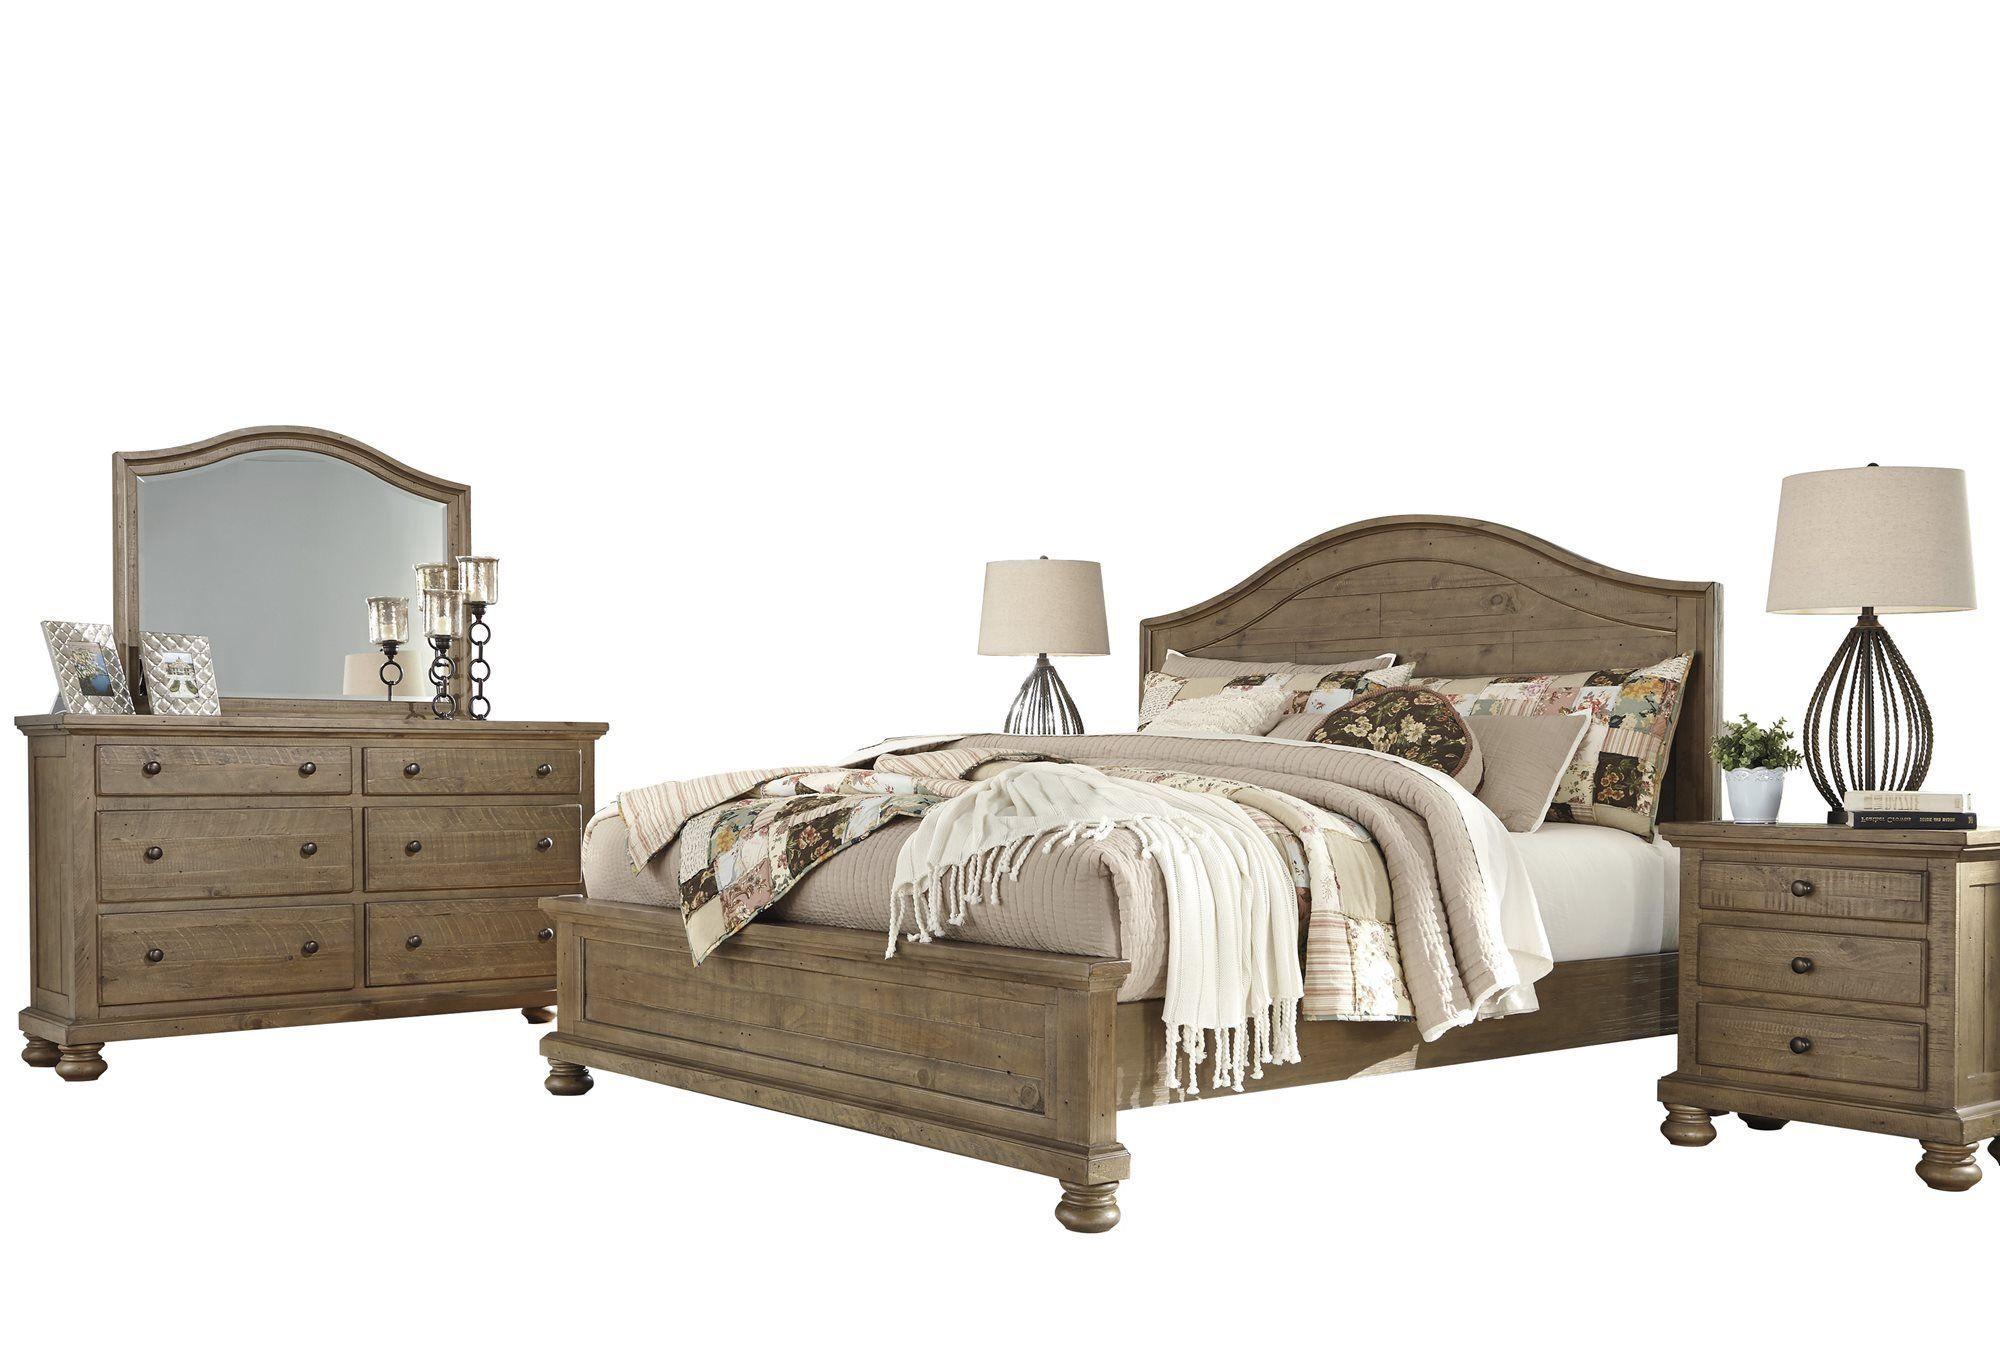 Ashley Trishley 5pc Bedroom Set Cal King Panel Bed Two Nightstand